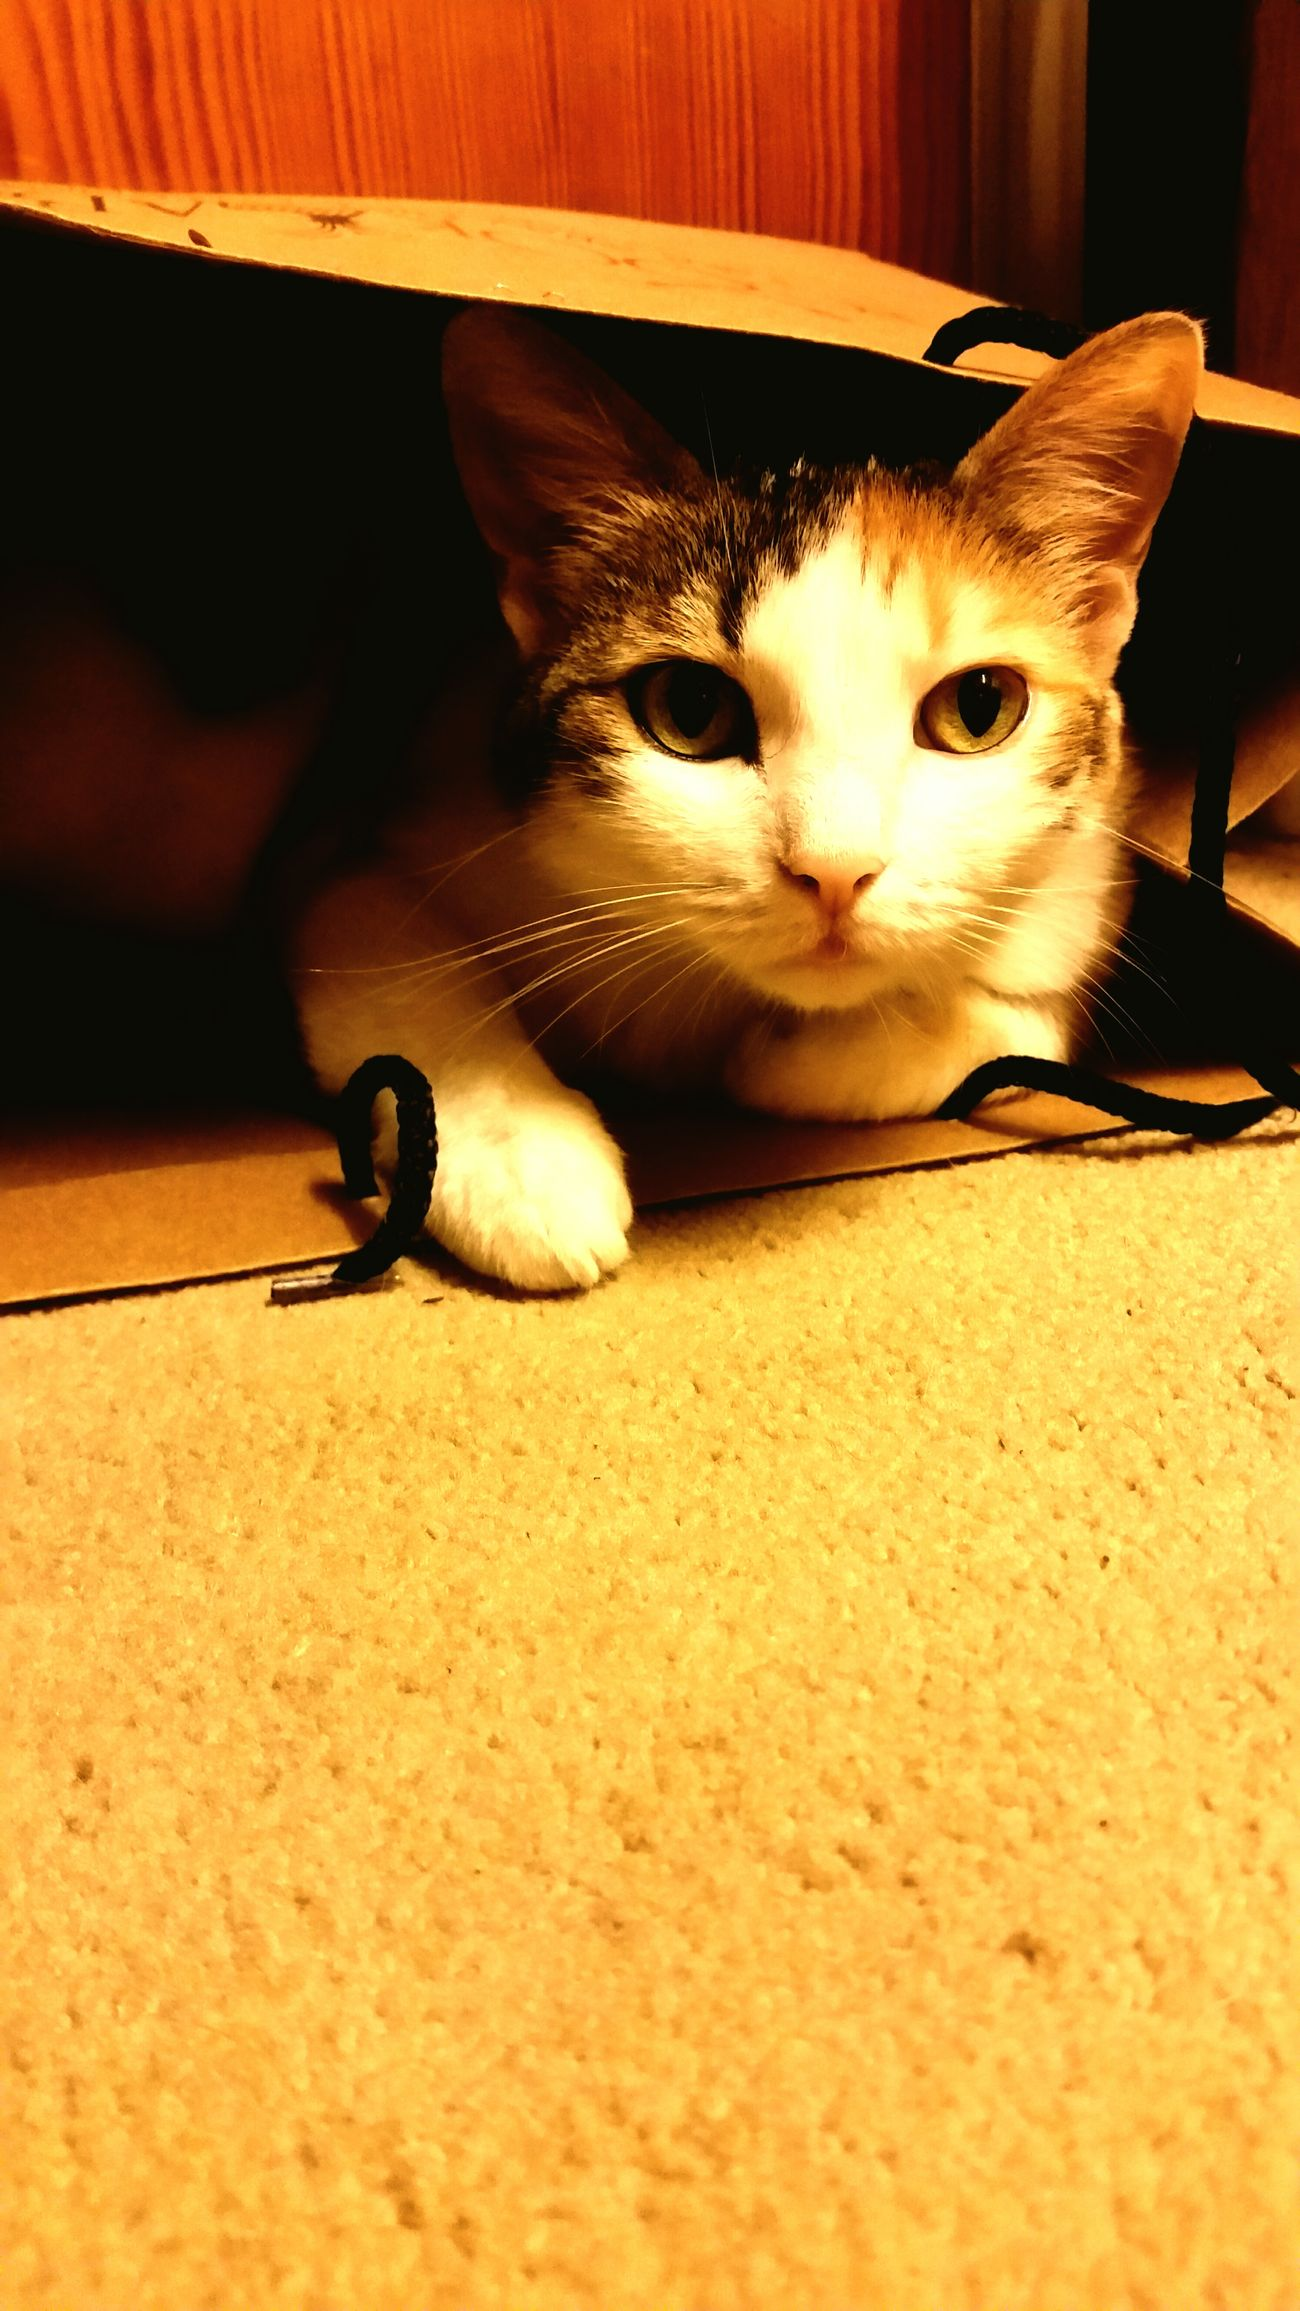 Pets Animal Themes Indoors  No People One Animal Cat Cat Lovers Cat♡ Cats 🐱 Catlovers Cats Of EyeEm Fındık Kedi Kedicik Beauty In Nature Beautiful Beauty Animal Pet Pet Photography  Pet Love Samsung Galaxy S5 PhonePhotography